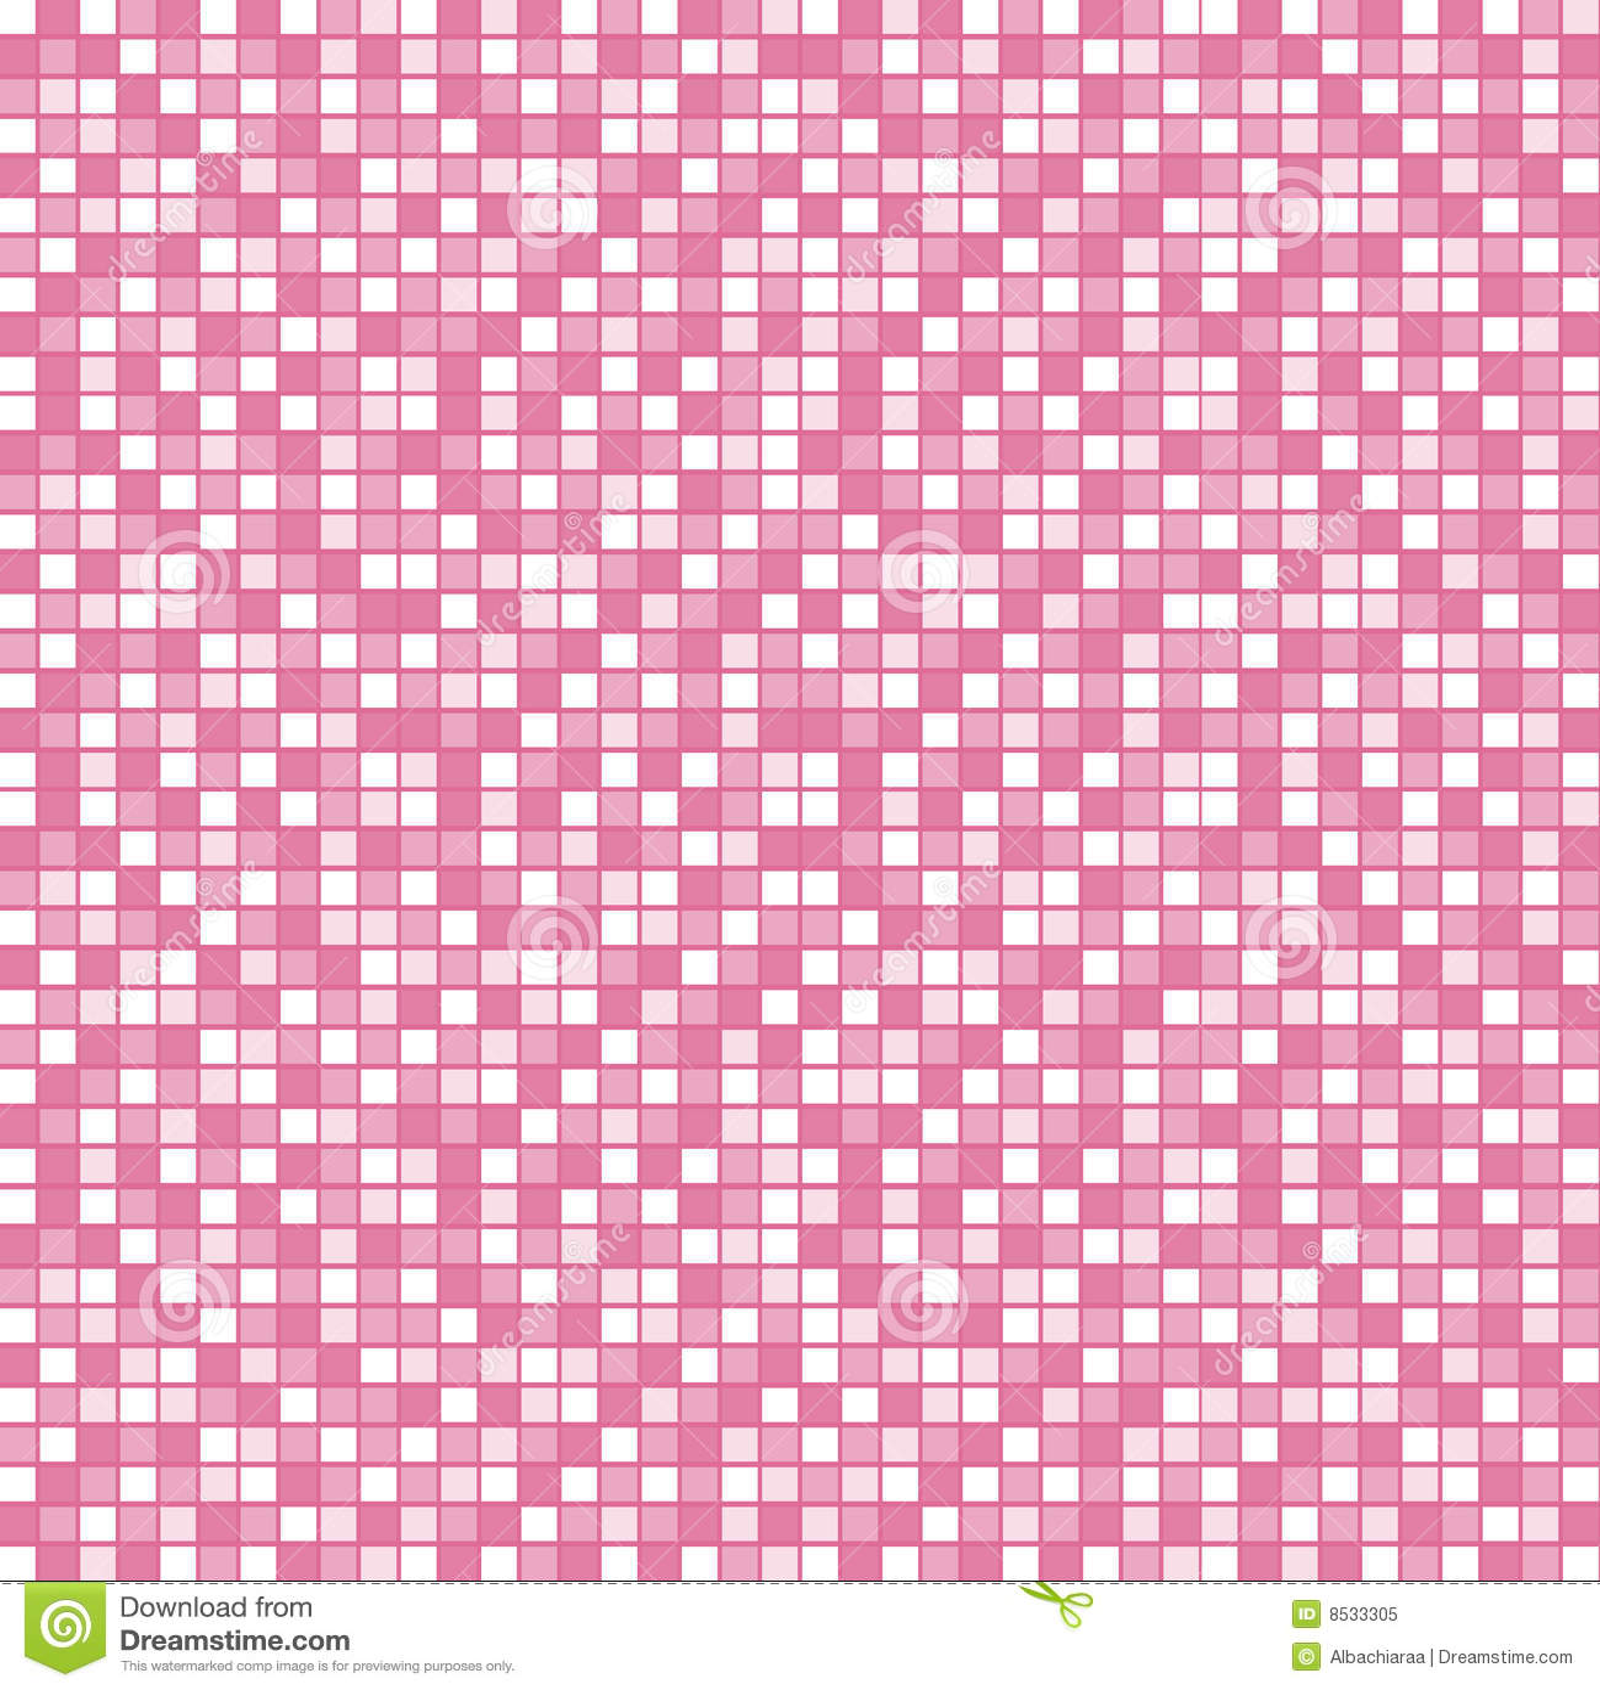 Pink mosaic stock vector. Illustration of floor, girl - 8533305